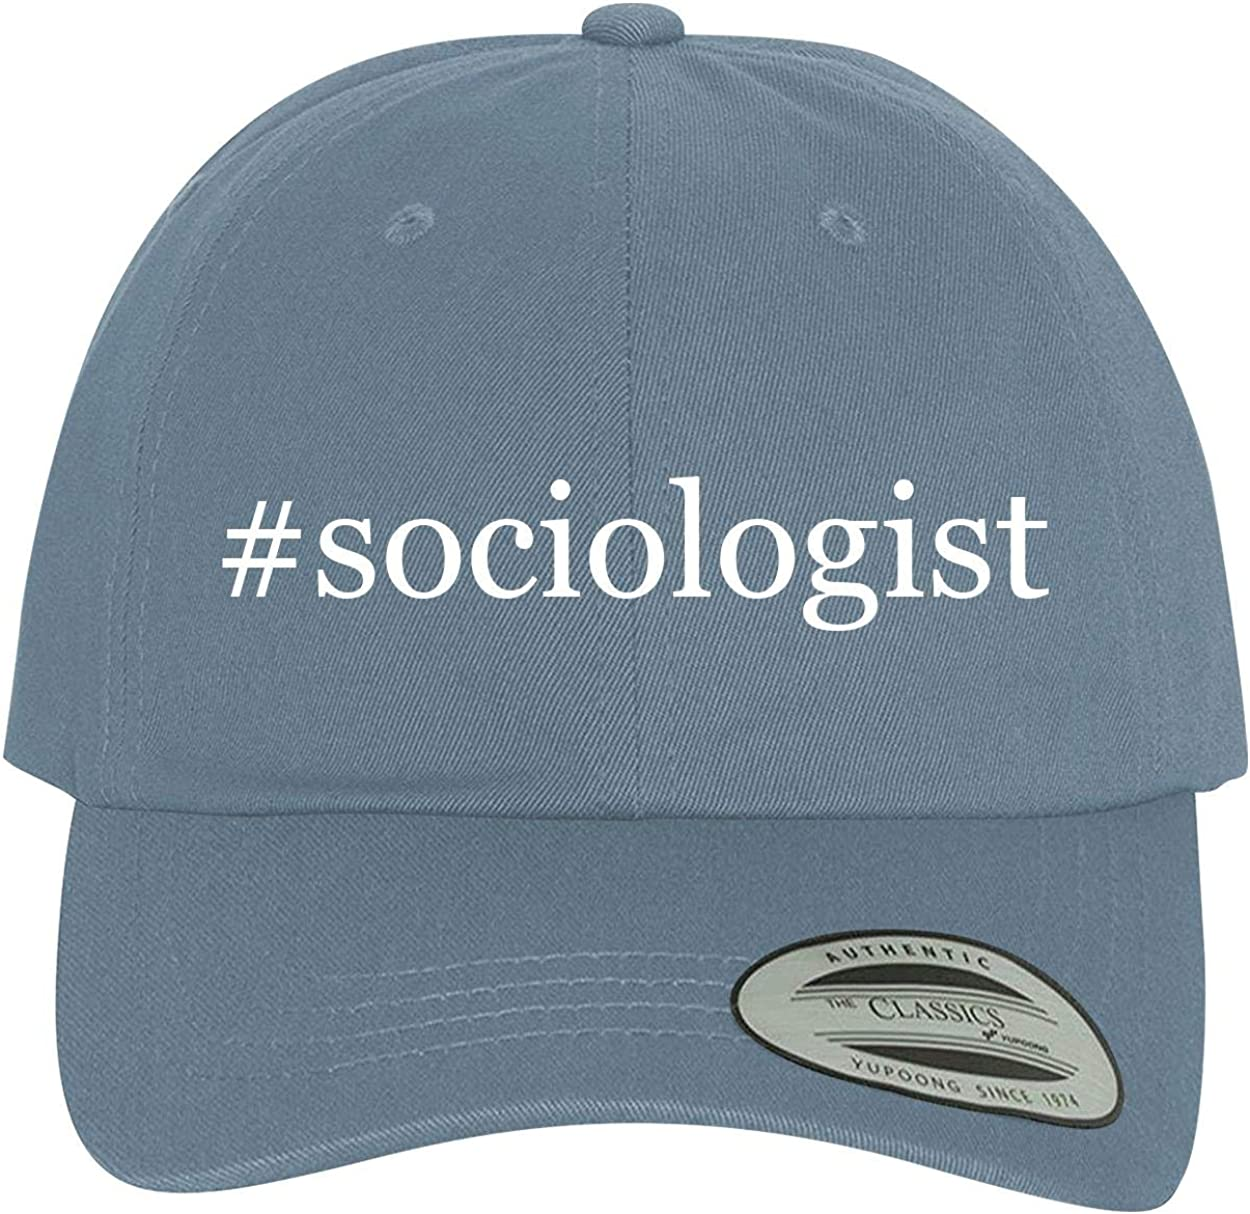 BH Cool Designs #Sociologist Comfortable Dad Hat Baseball Cap